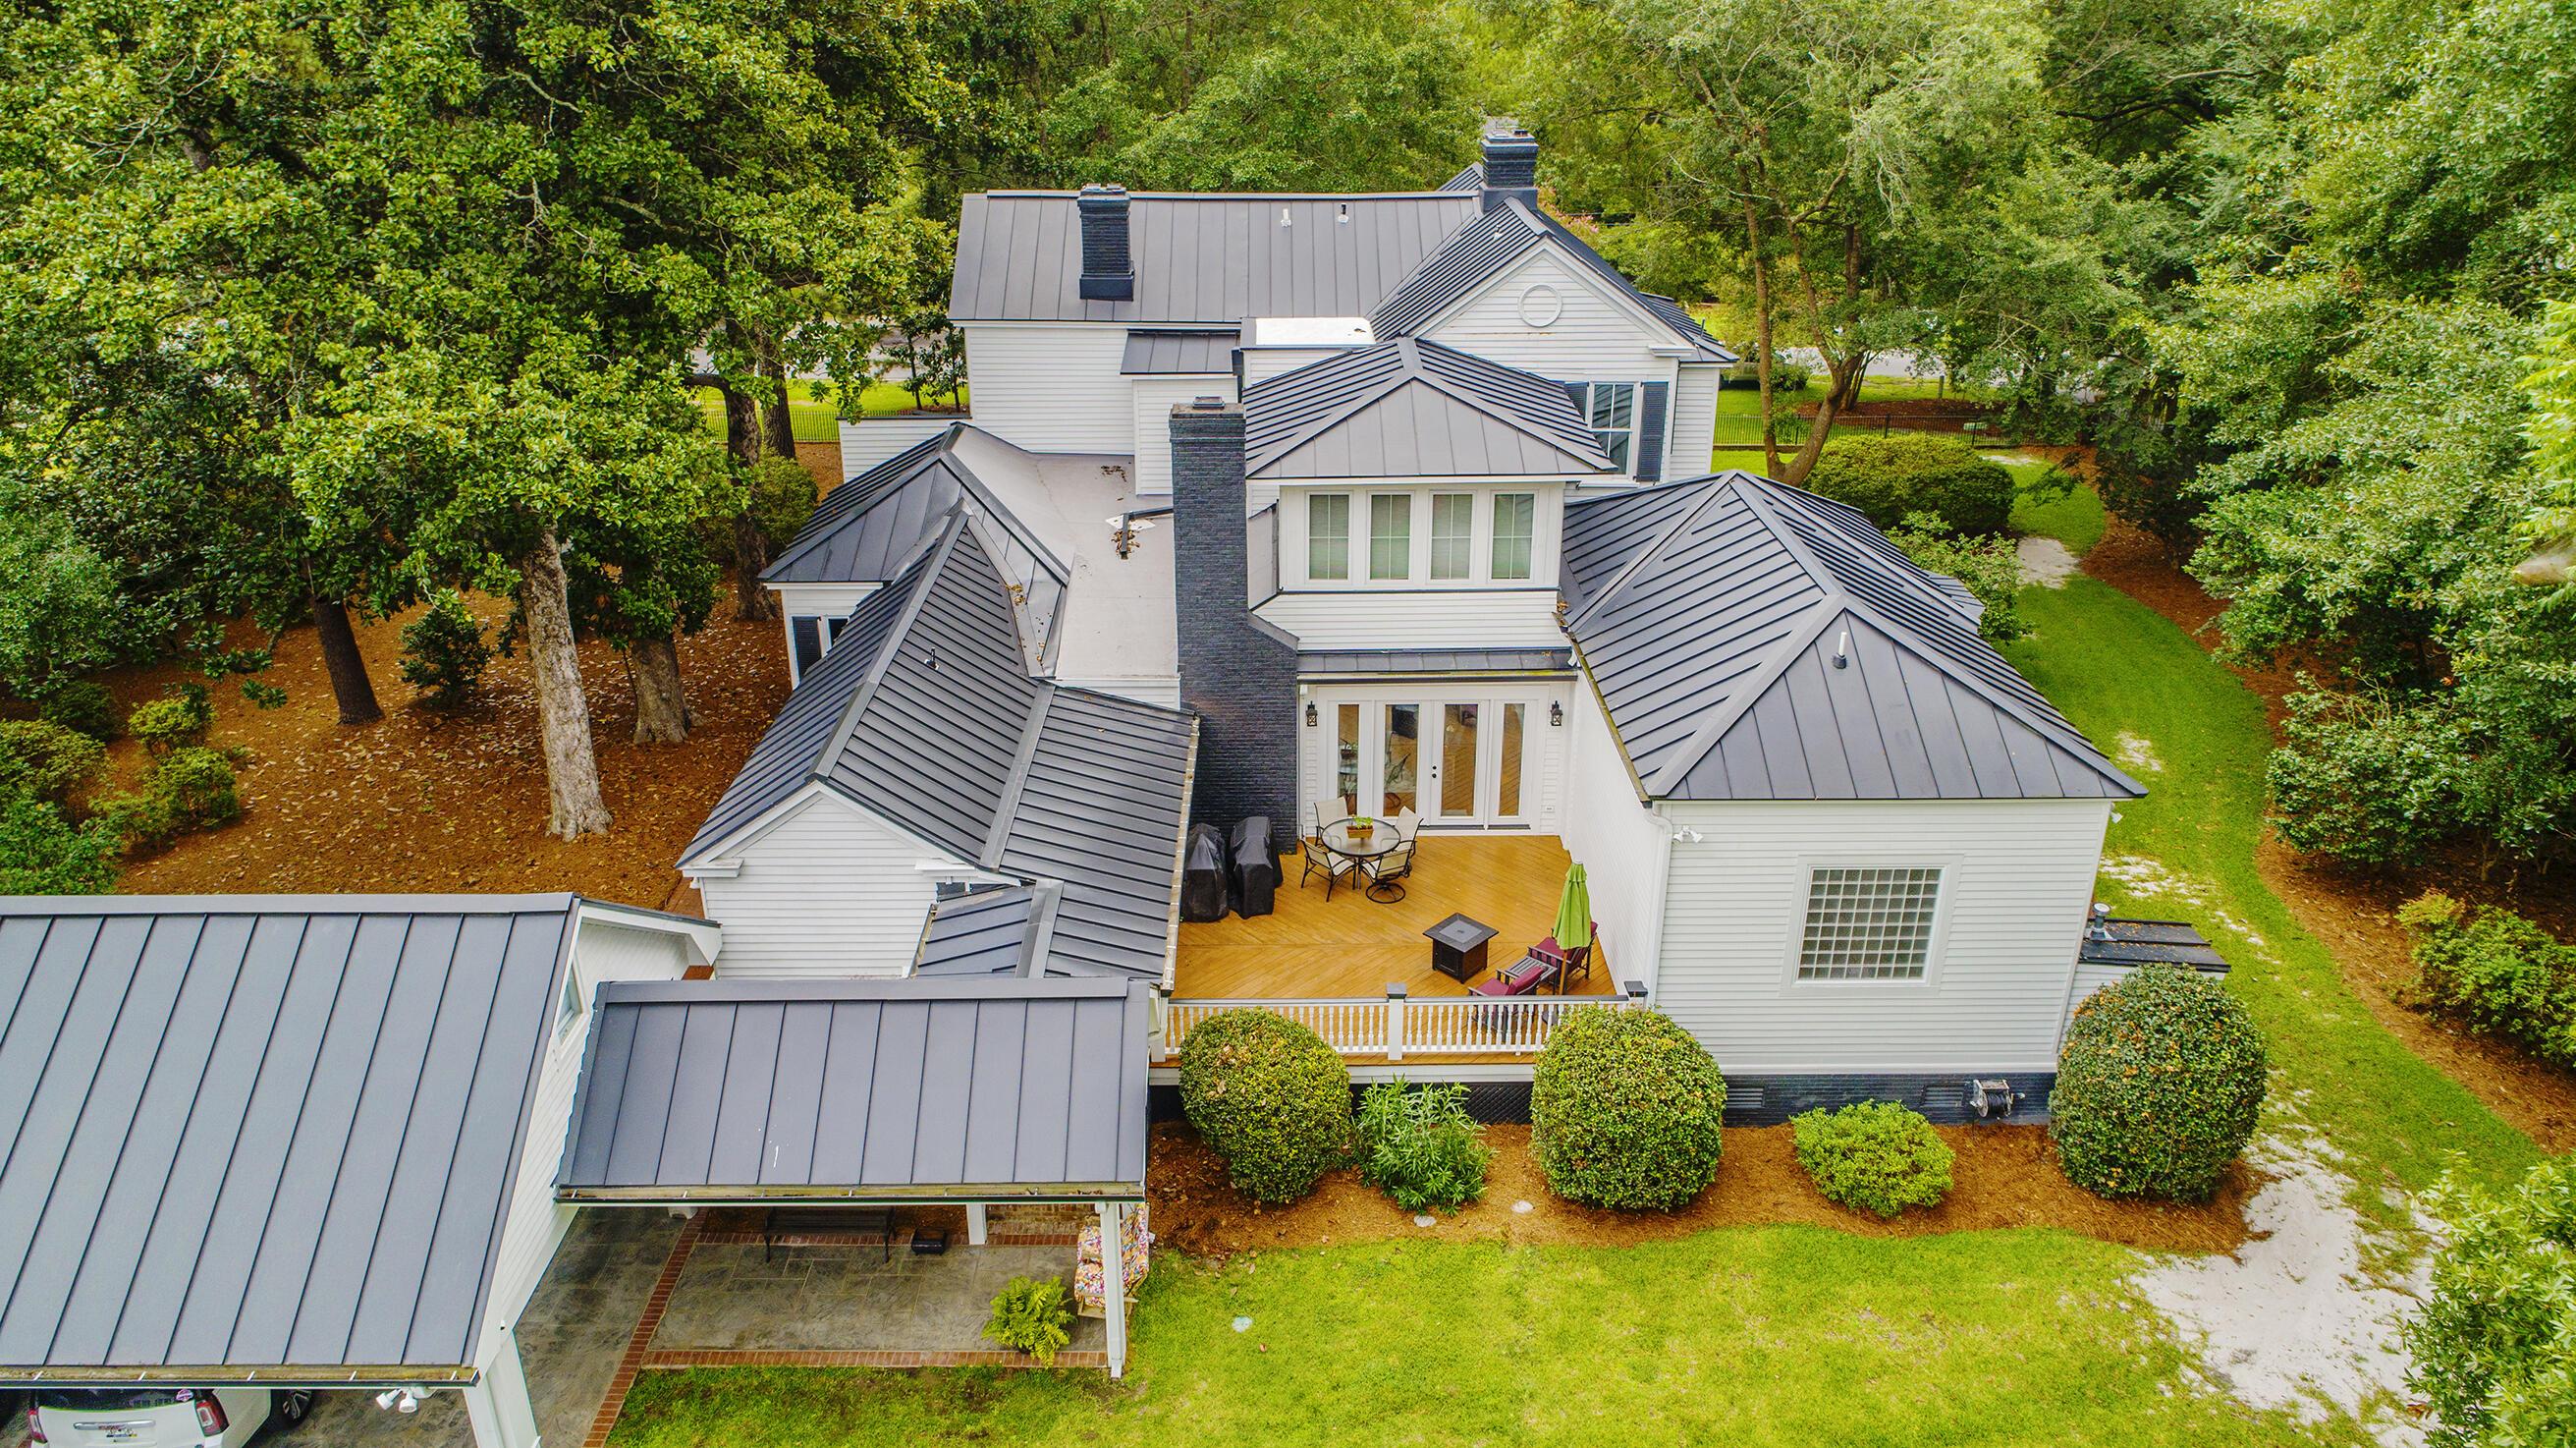 Summerville Homes For Sale - 102 Hickory, Summerville, SC - 14